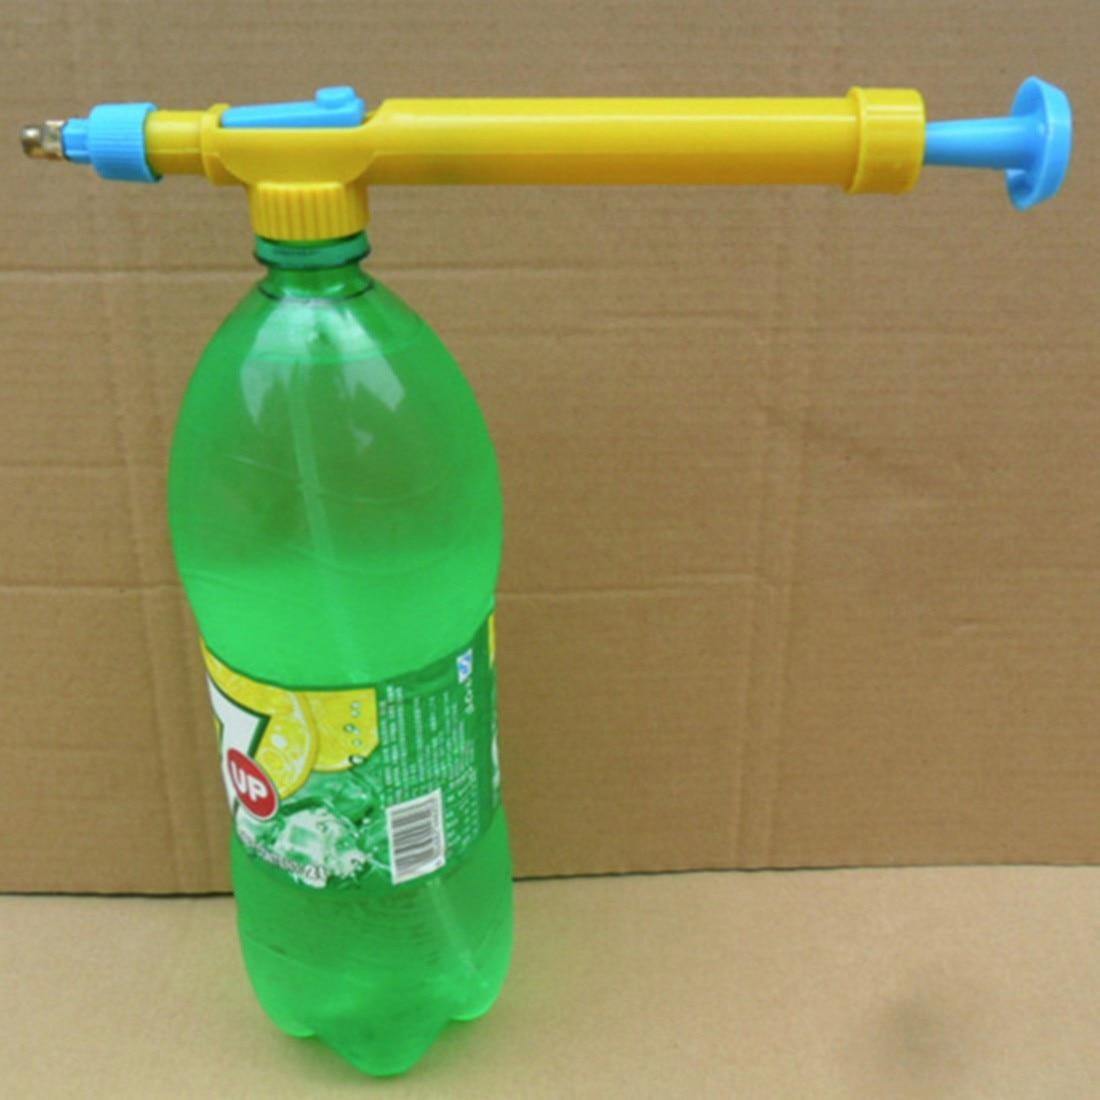 Mini Juice Bottles Interface Plastic Trolley Gun Sprayer Head Water Pressure Sprayer For Garden Bonsai Water Pesticide Spraying